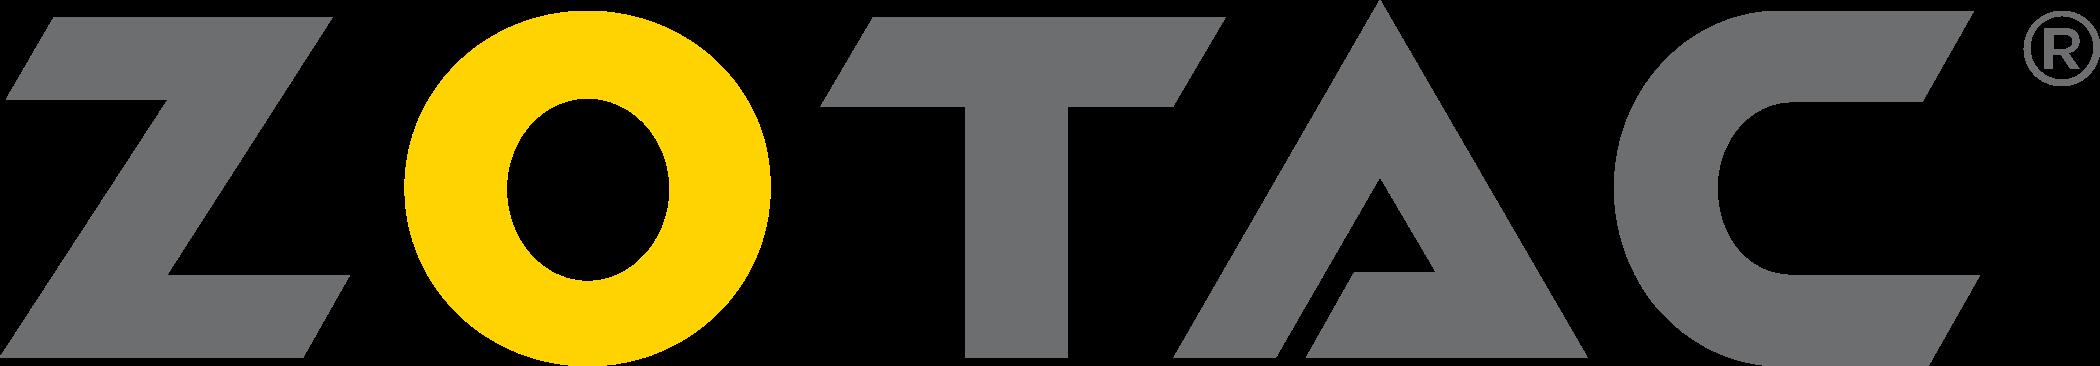 zotac-logo-1